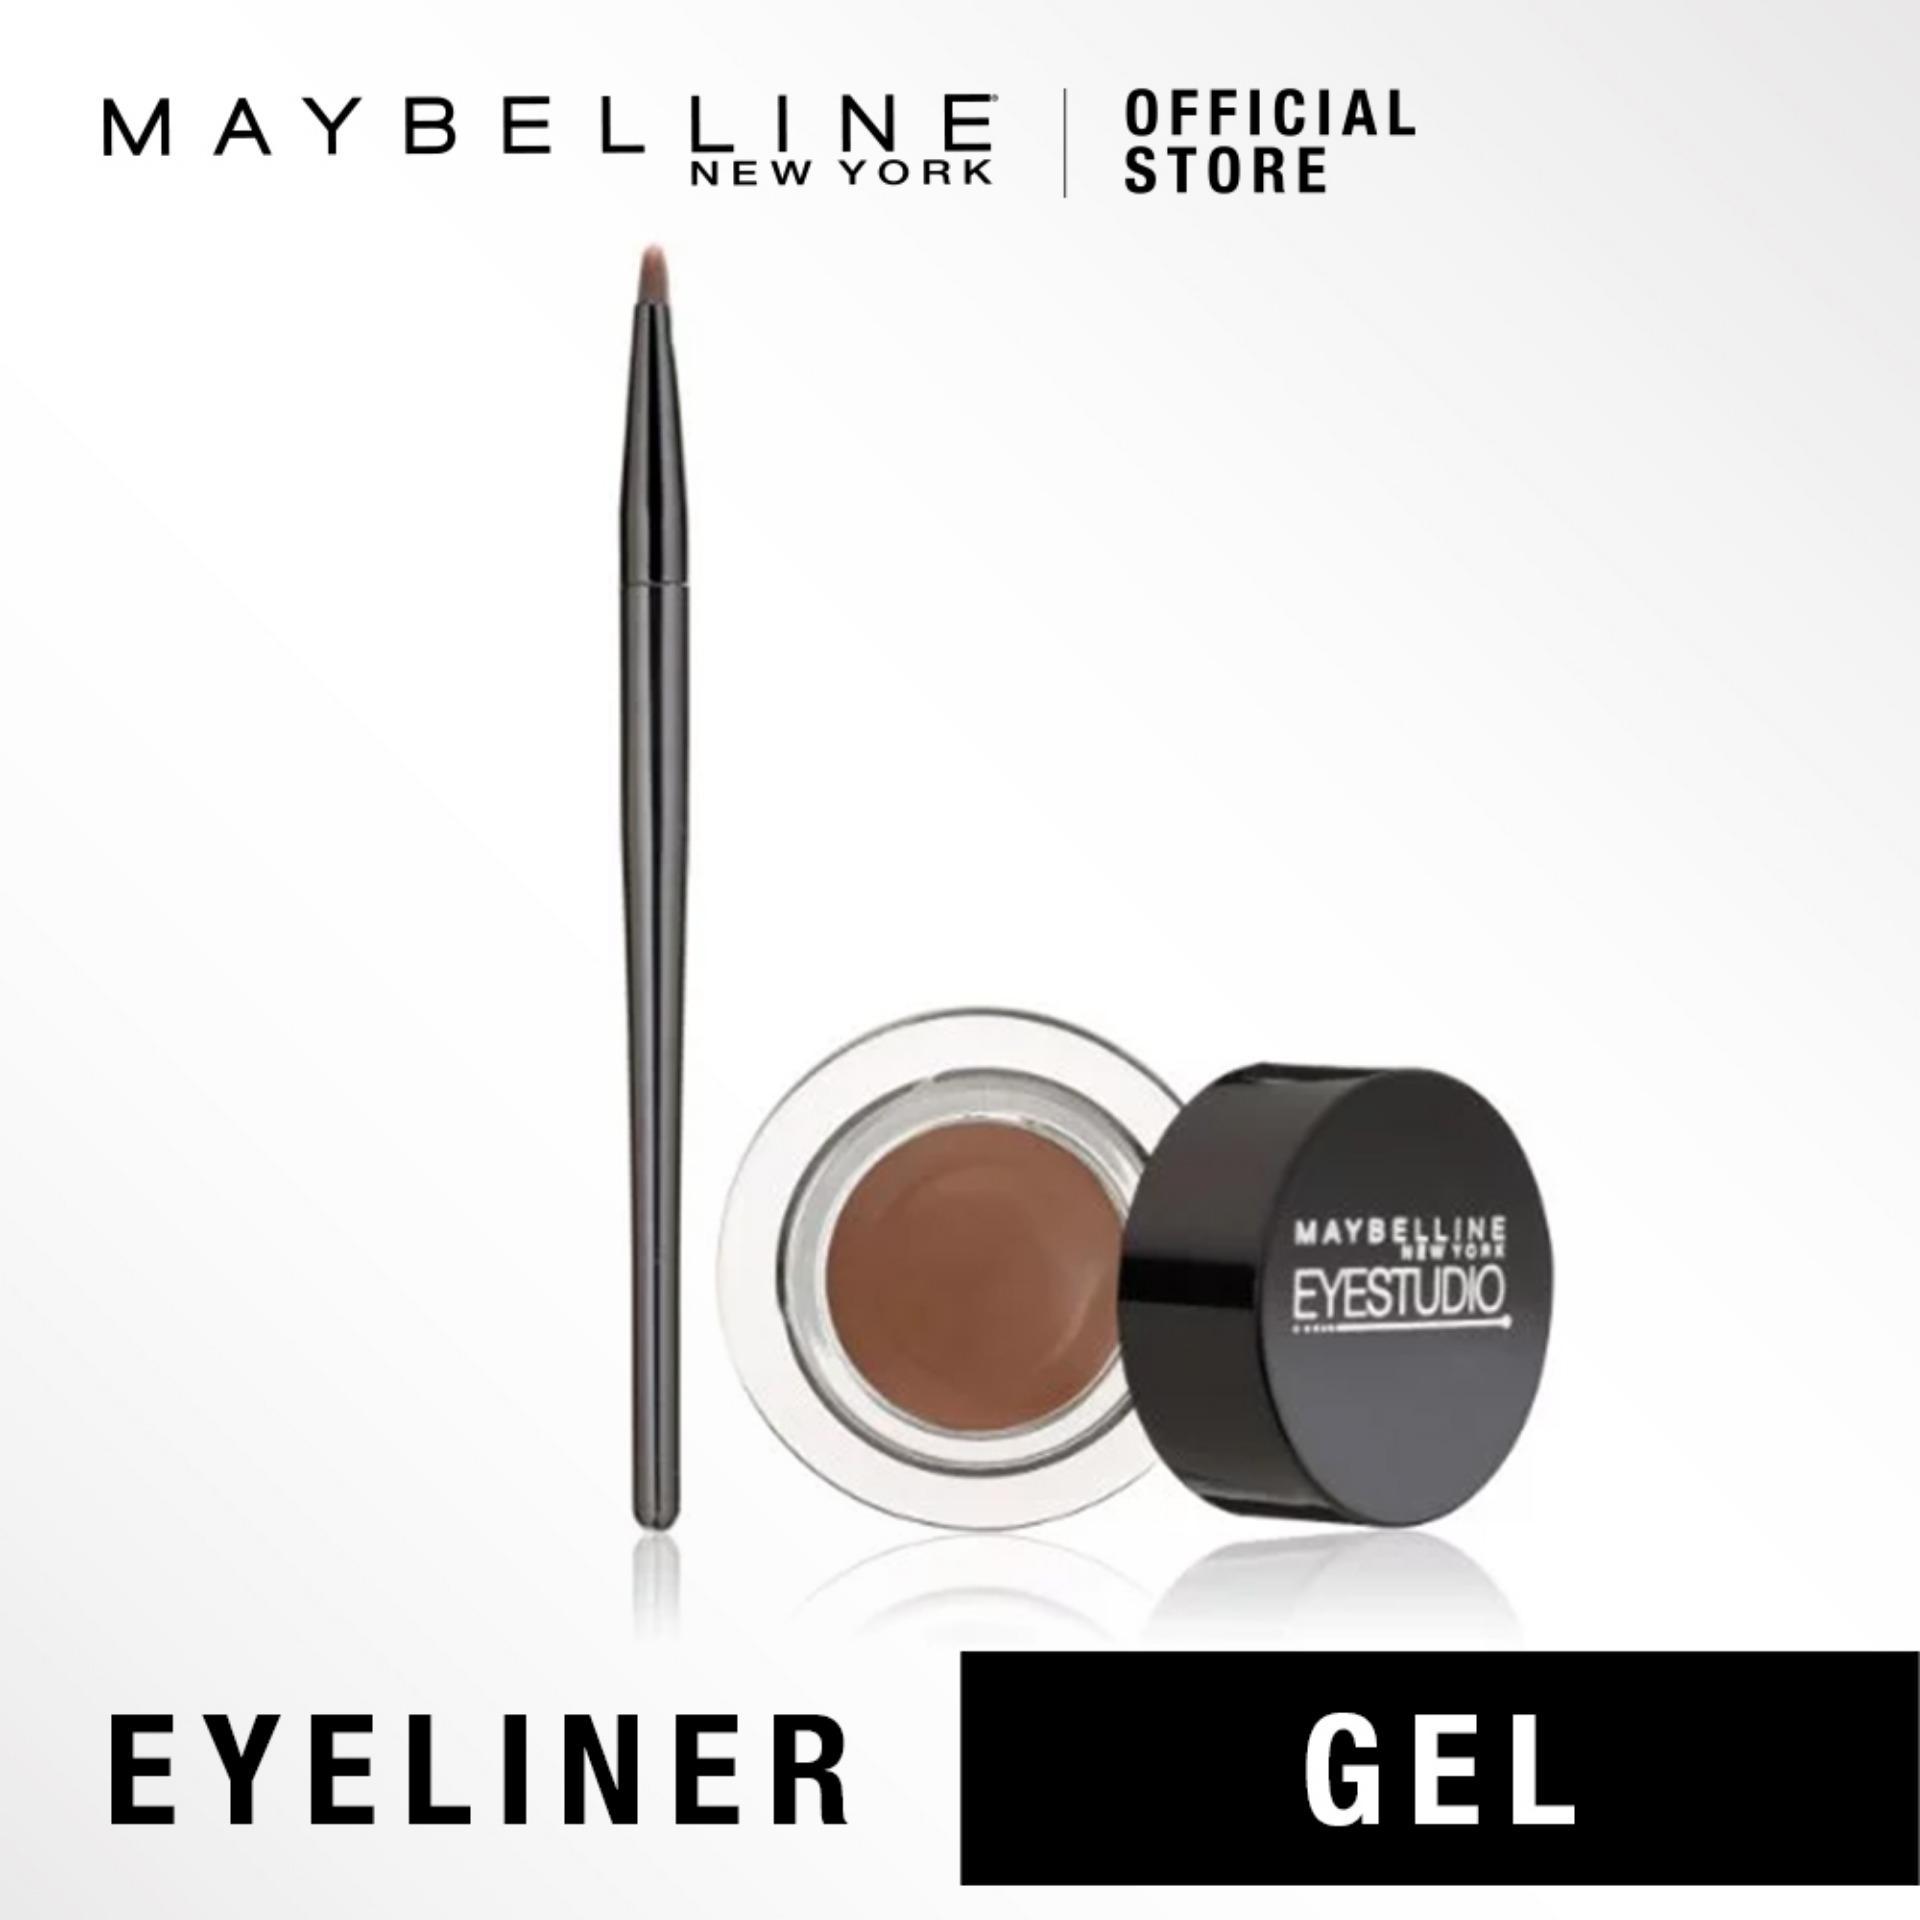 Review Maybelline Eyestudio Lasting Drama Gel Liner On Singapore